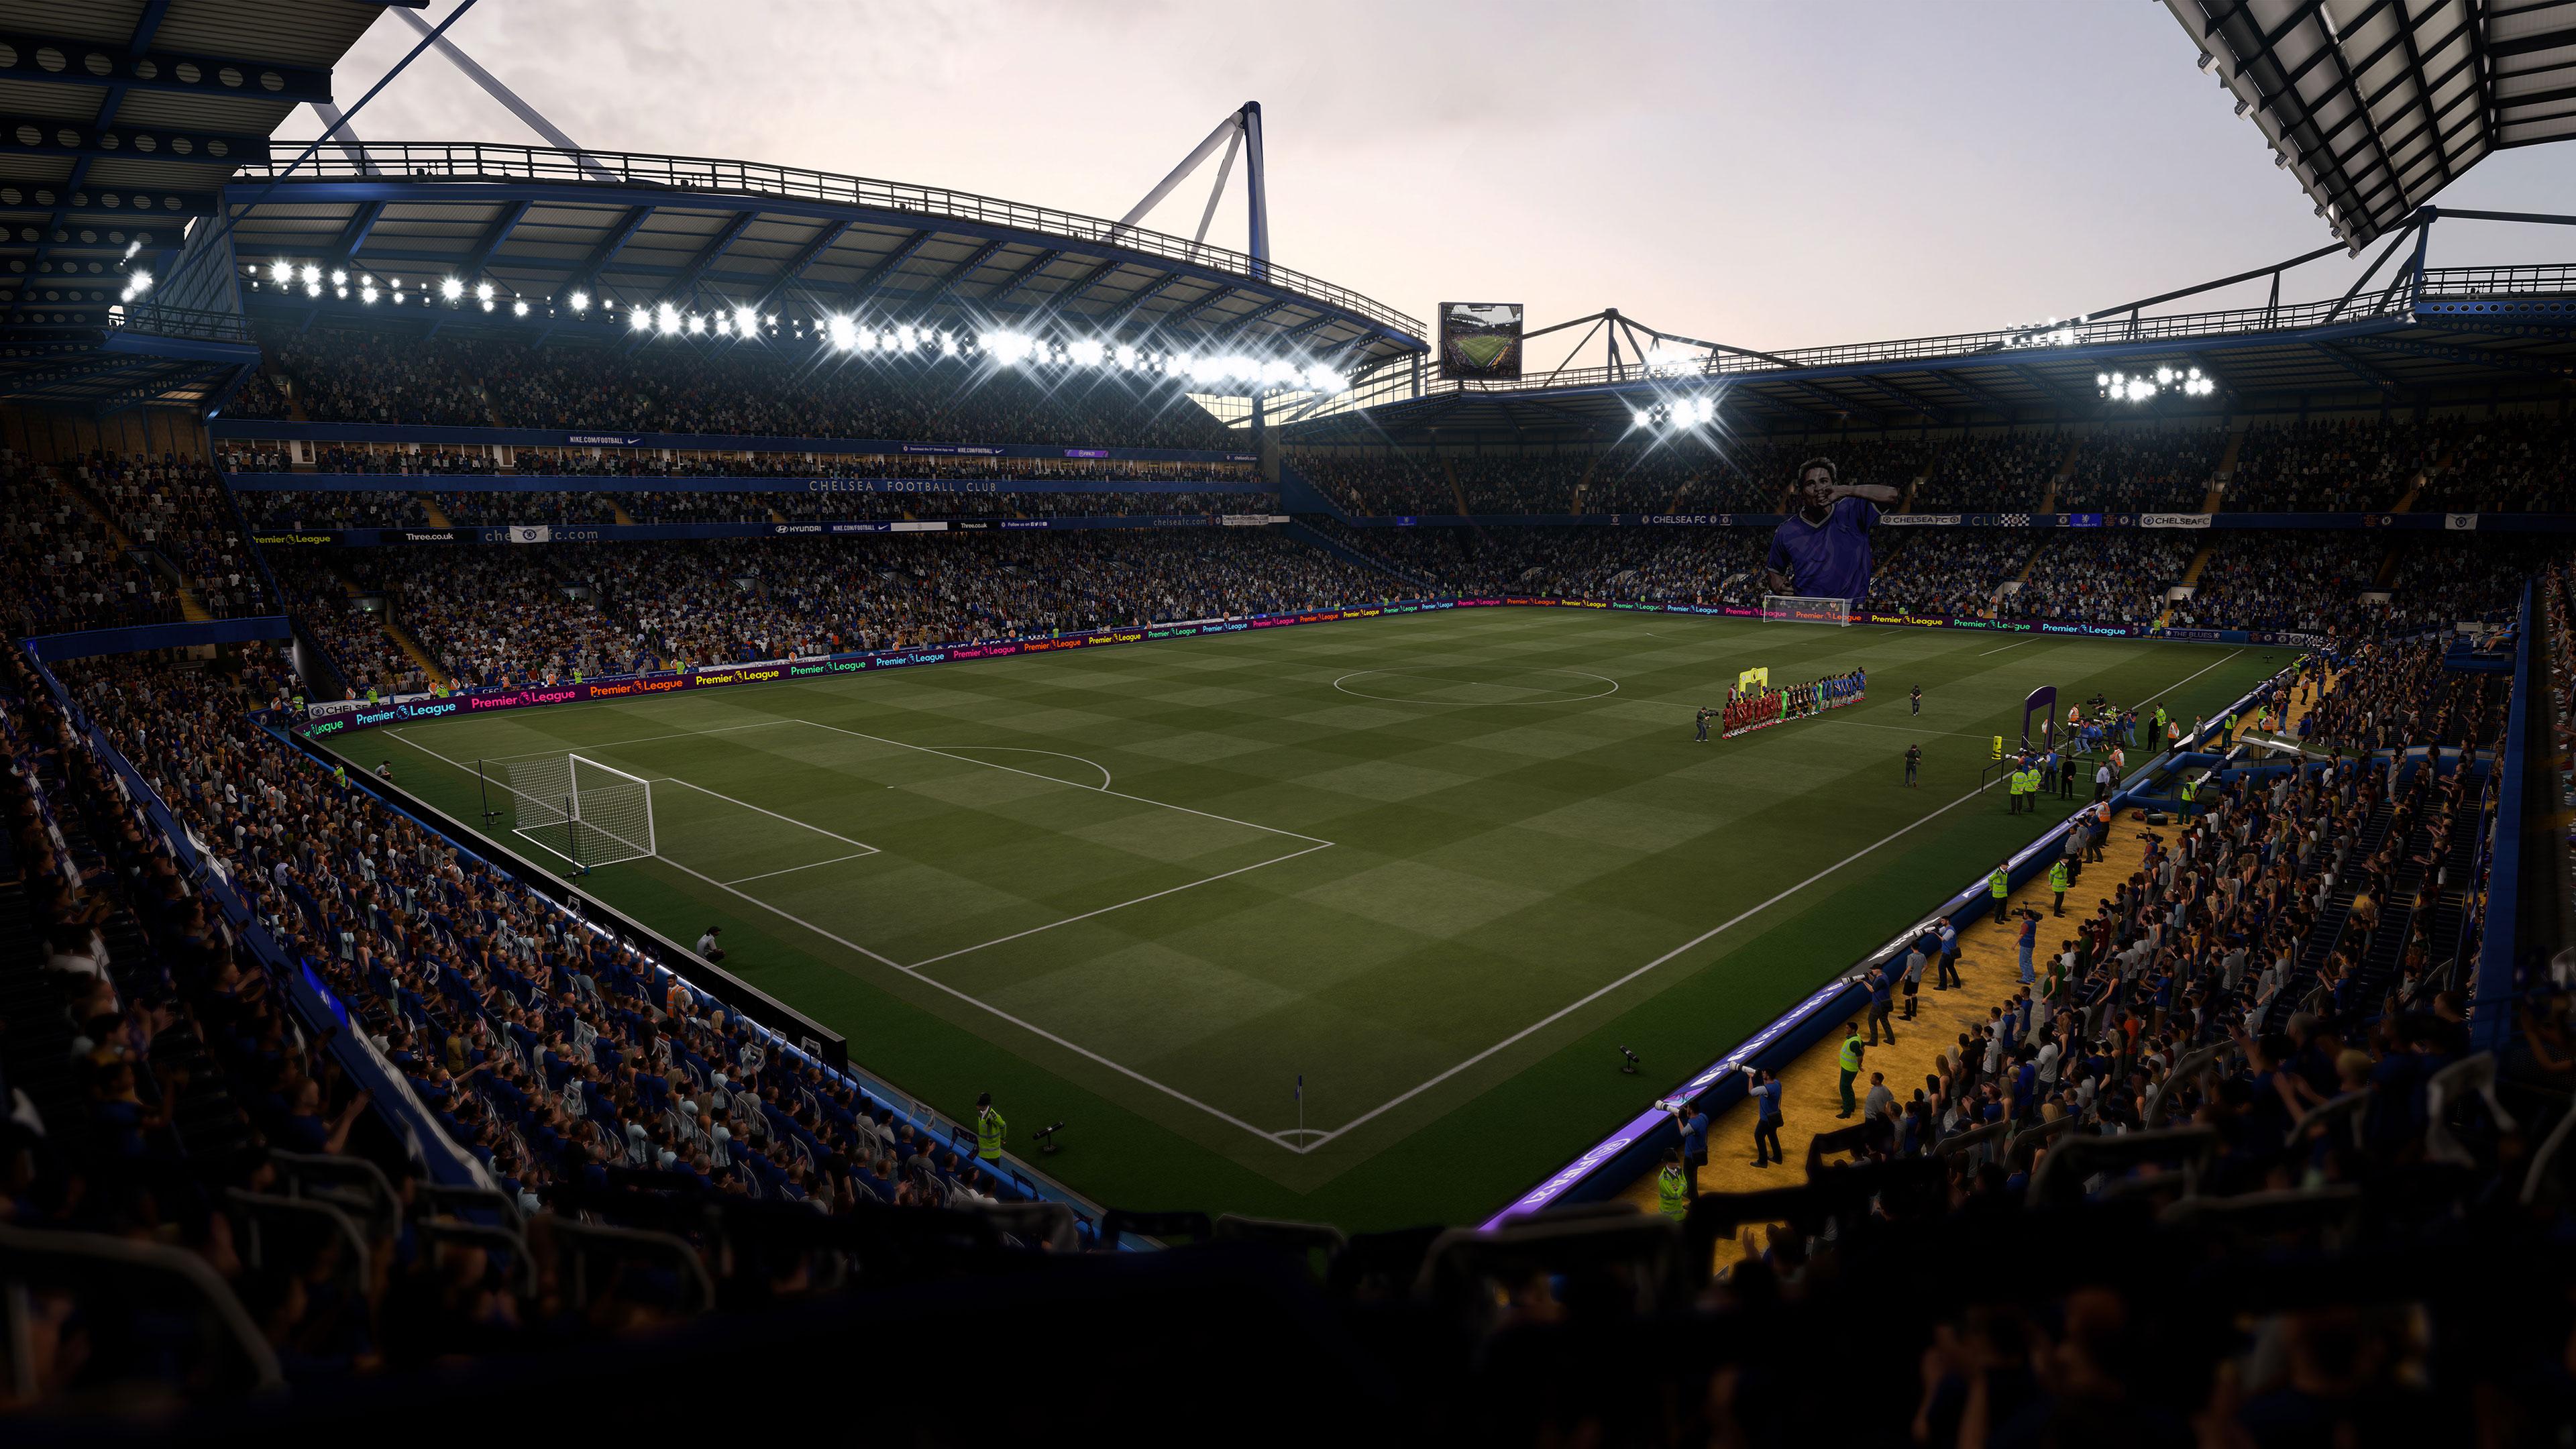 Скриншот №10 к FIFA 21 издание Champions PS4 and PS5